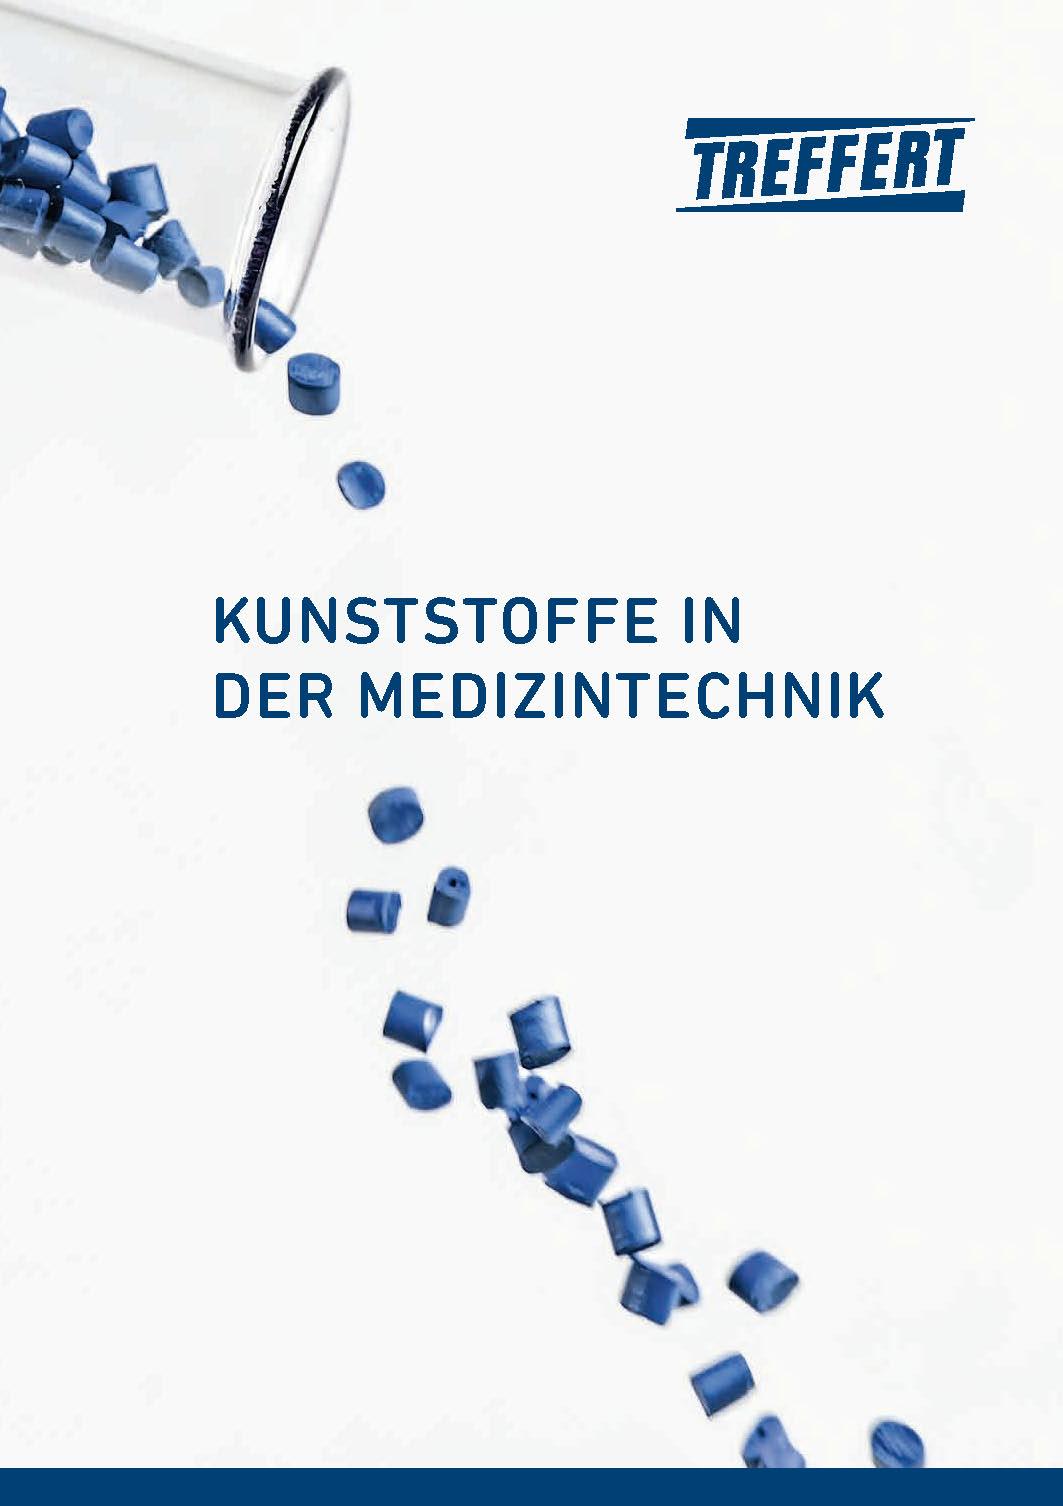 Treffert Broschüre - Kunststoffe in der Medizin